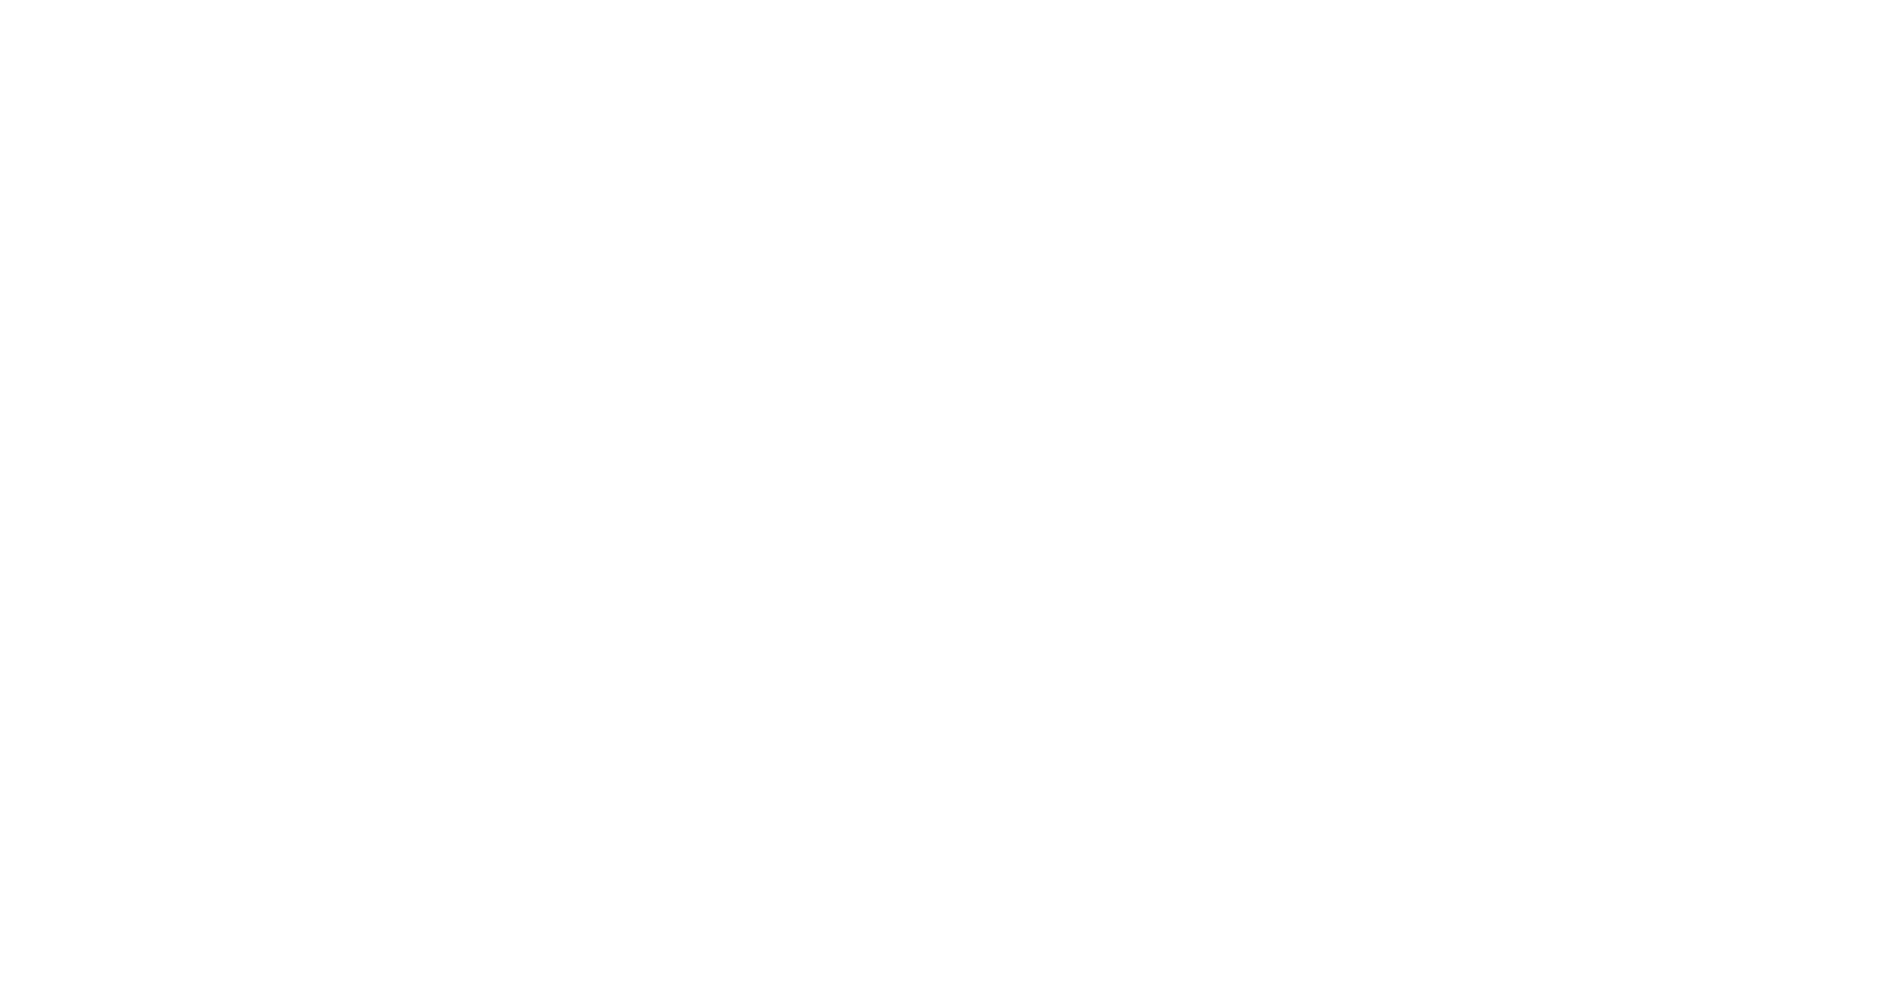 VFW-12150-PNGWhite